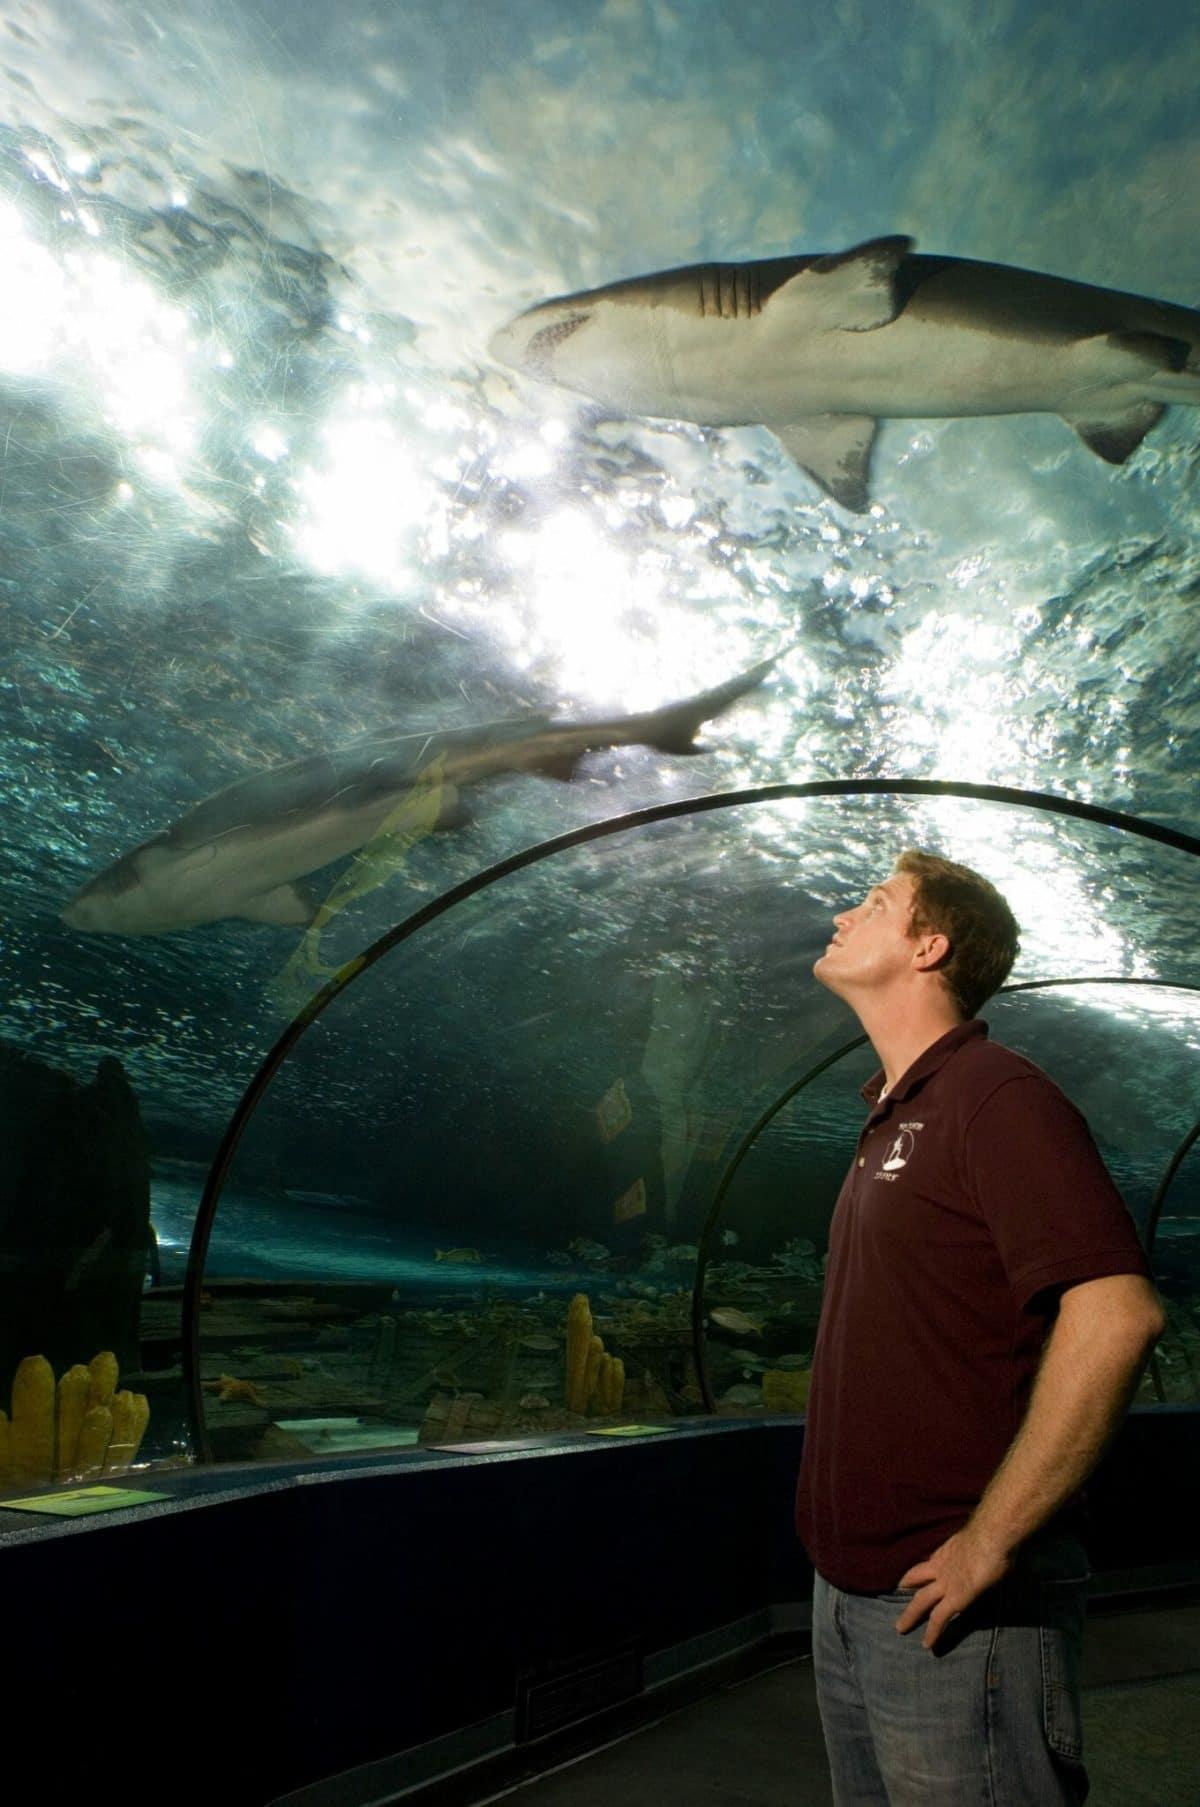 Ripley's Aquarium Myrtle Beach